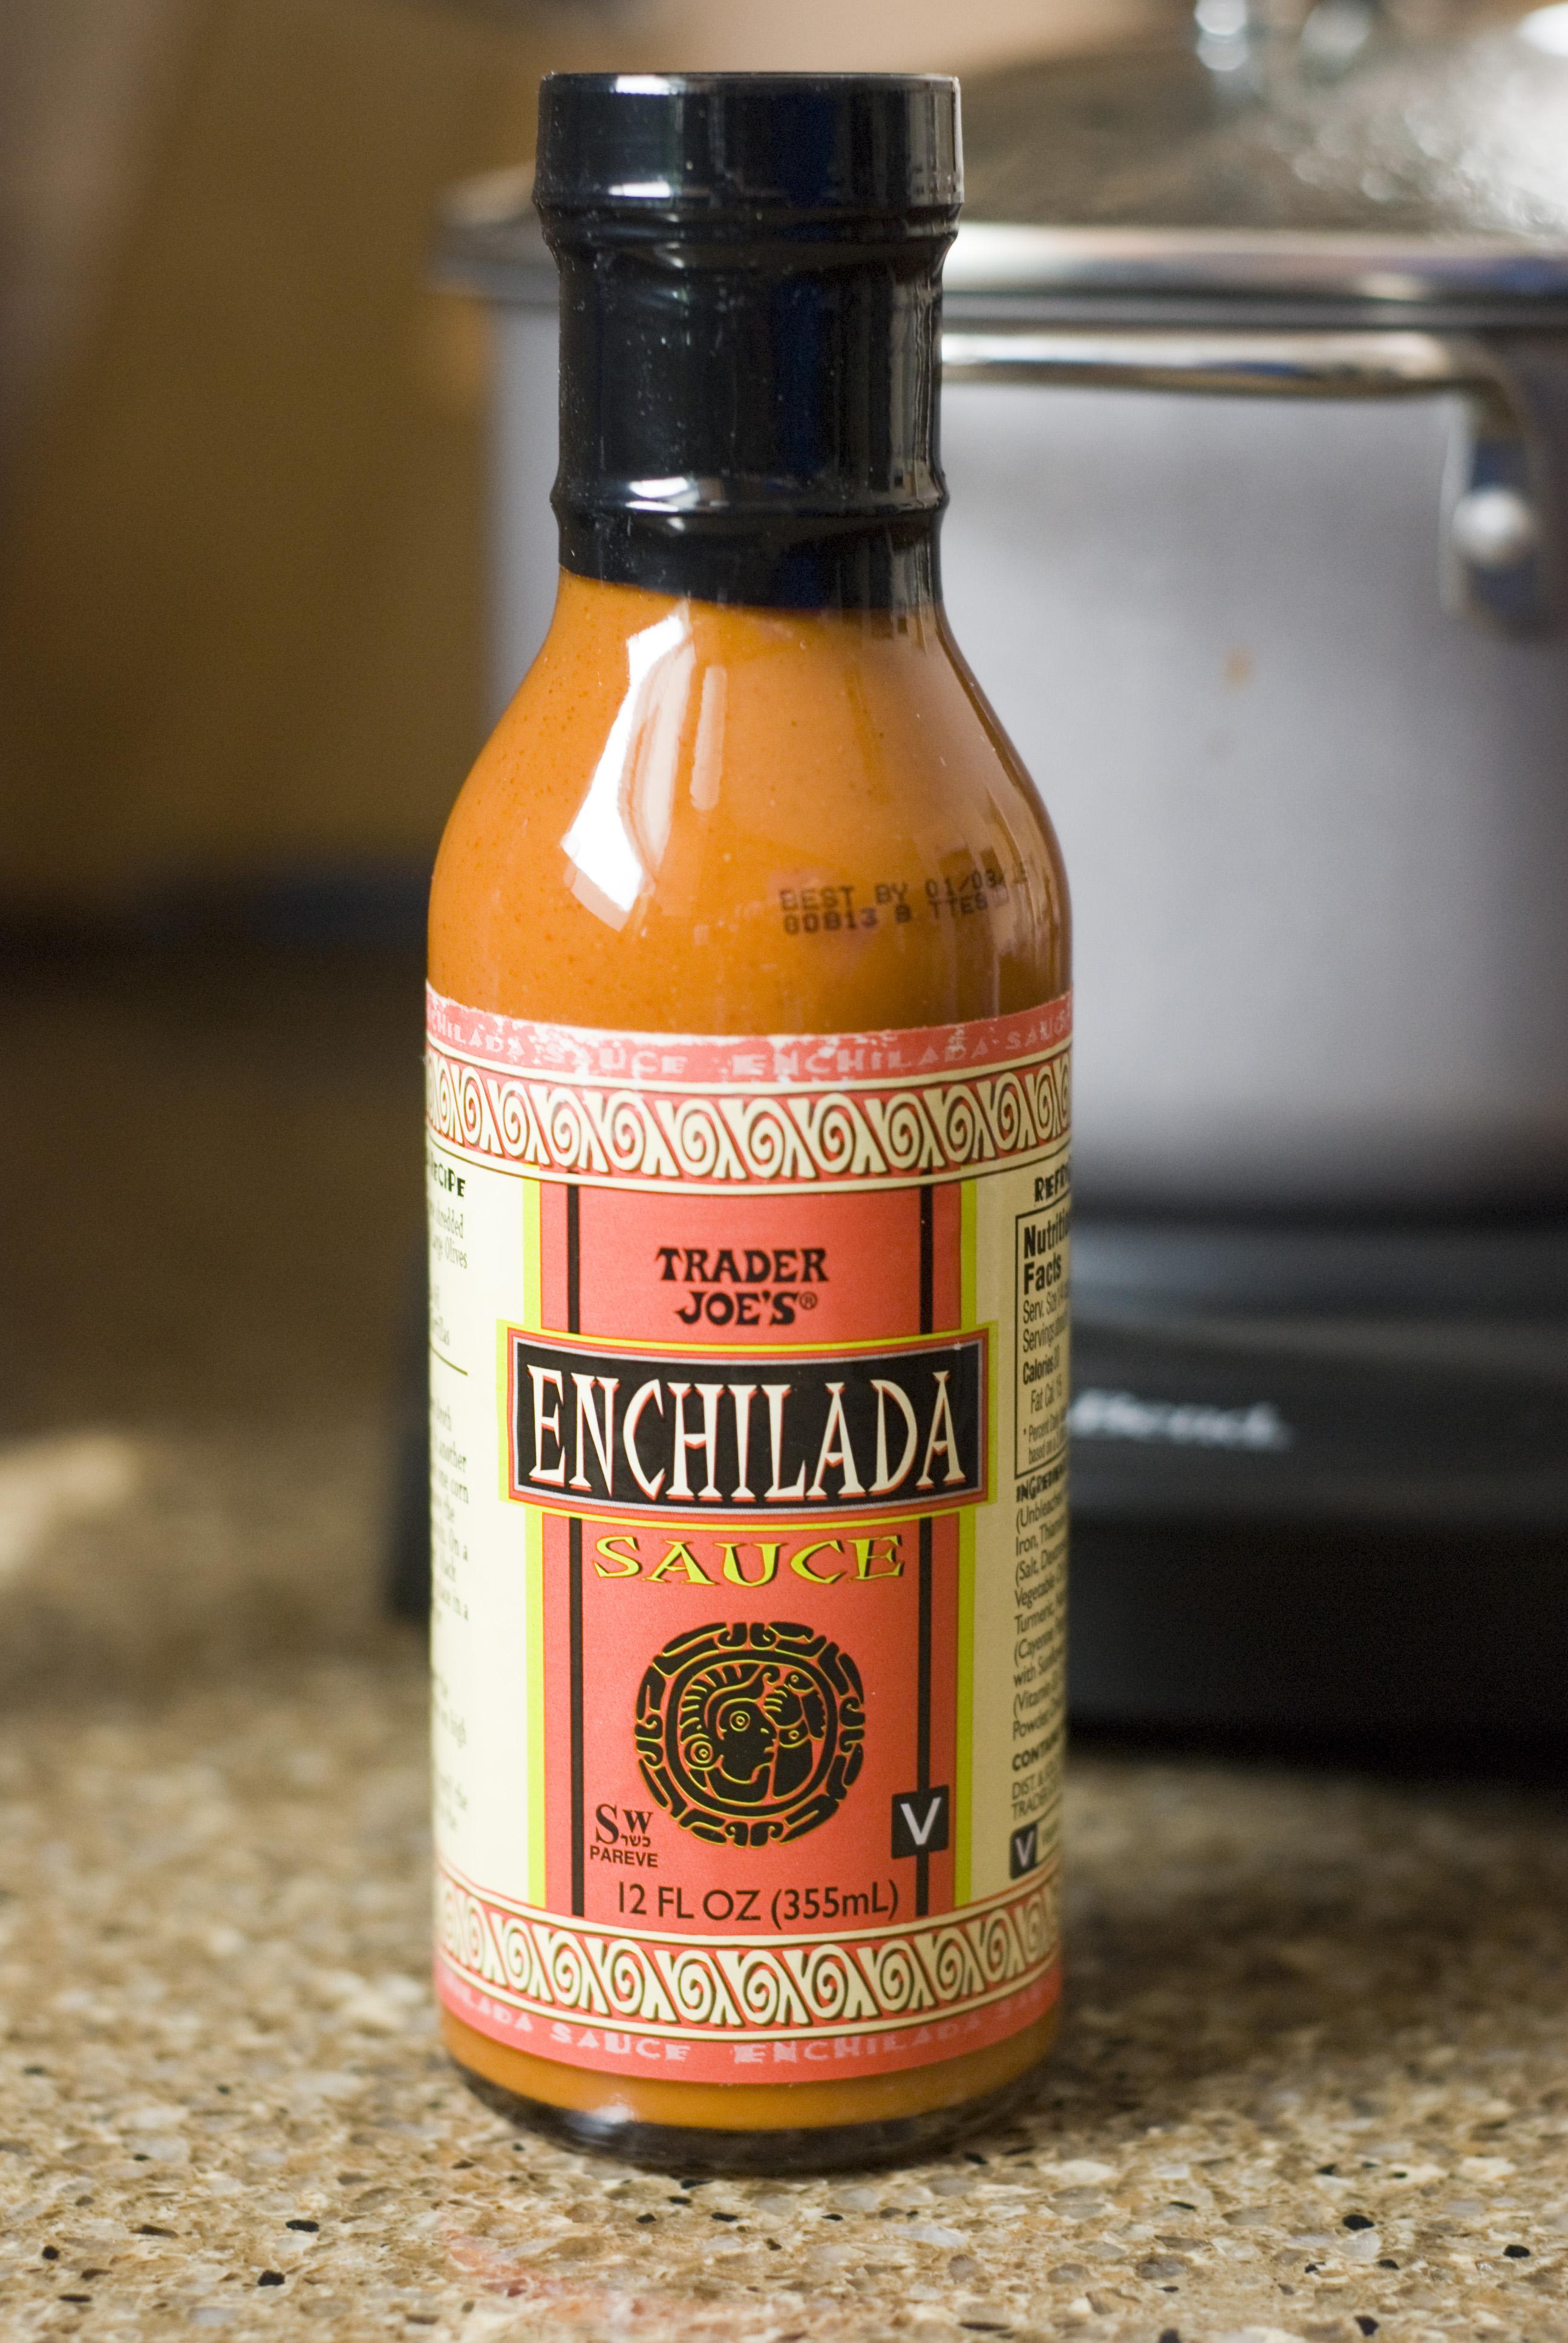 More of what we love at trader joe s and costco for Trader joe s fish sauce